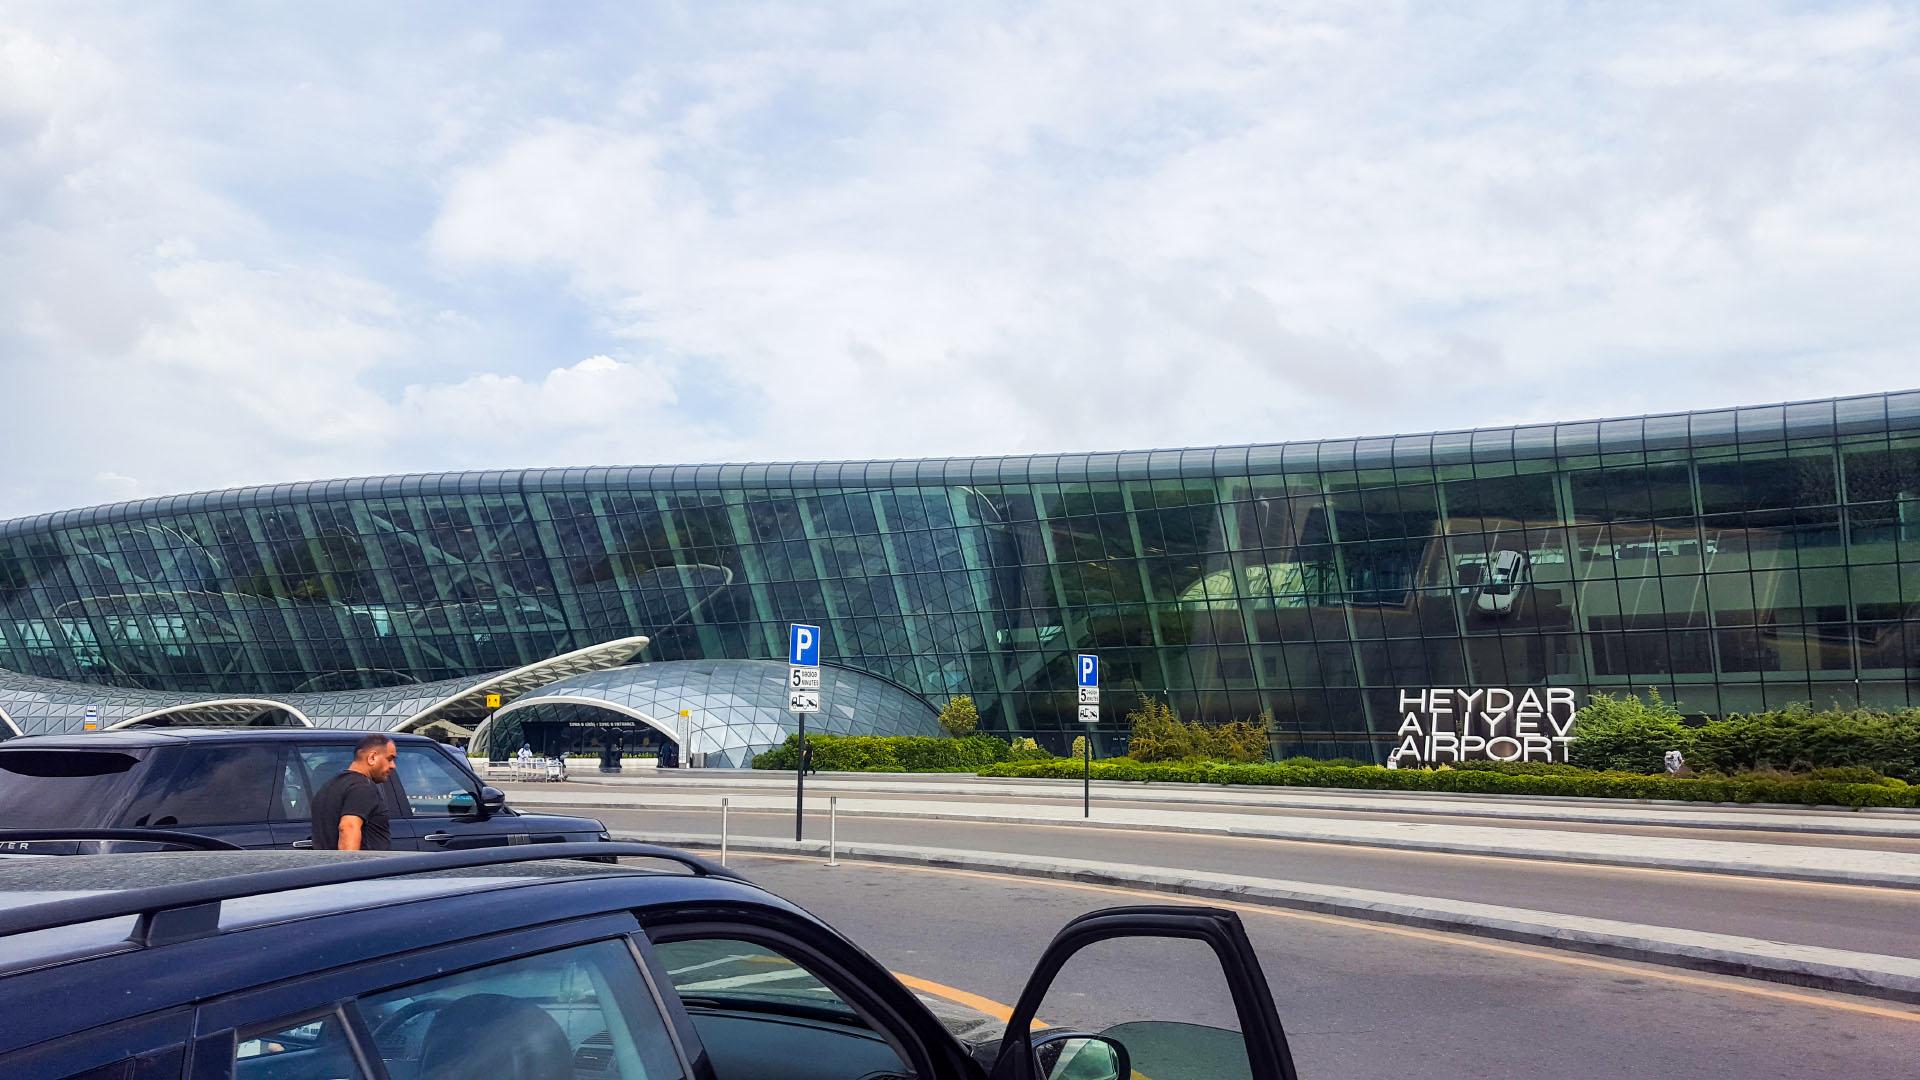 مطار حيدر علييڤ